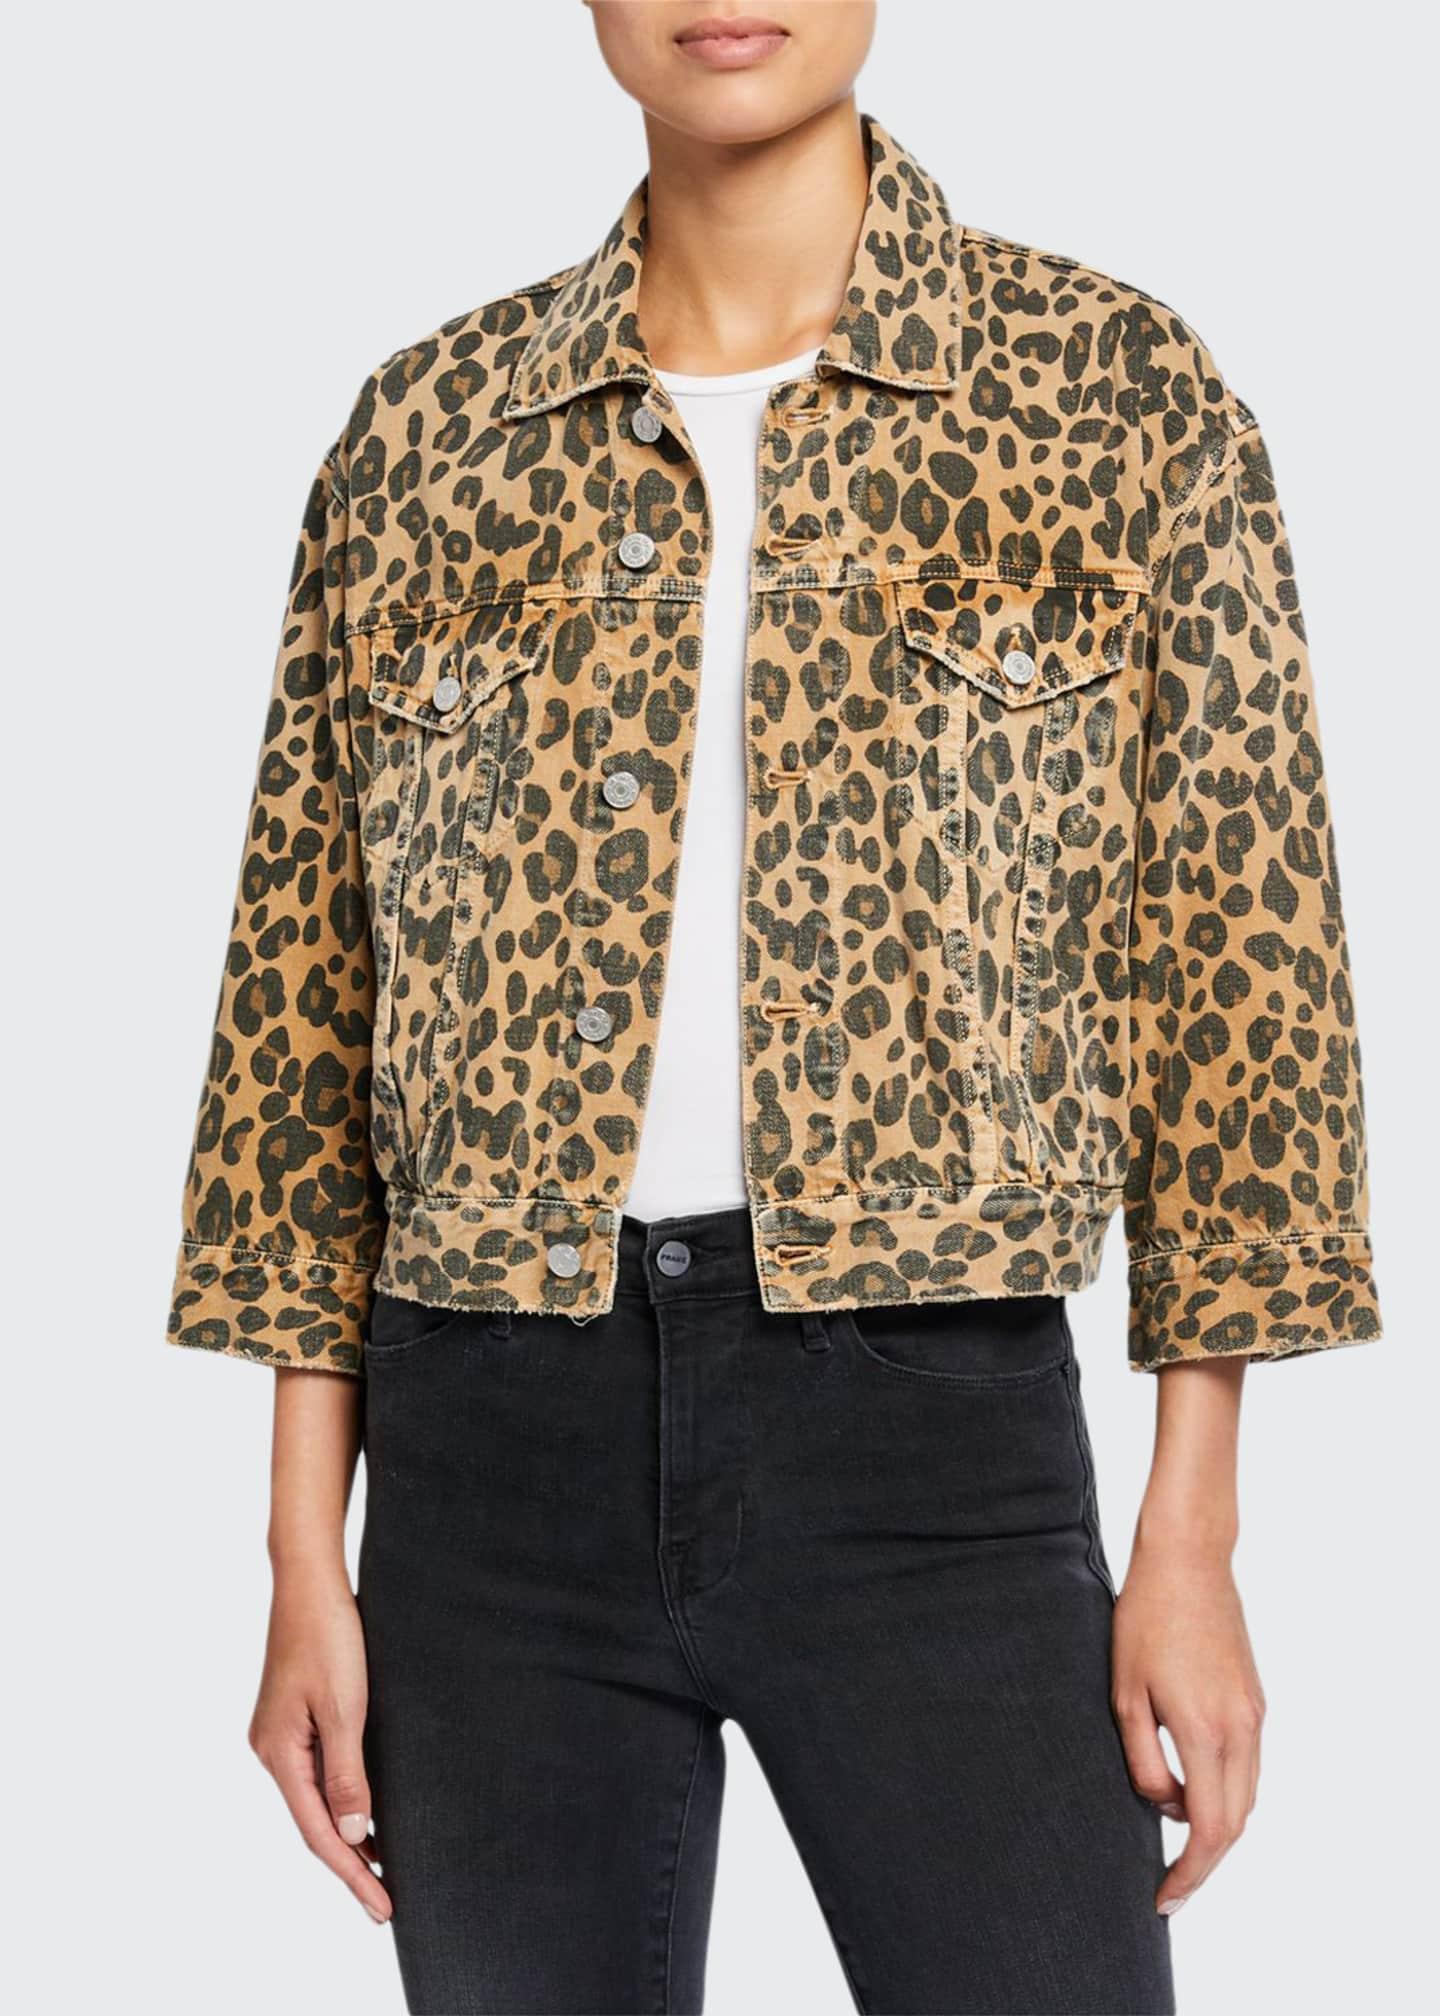 AMO Denim Lulu Cropped Leopard-Print Jacket